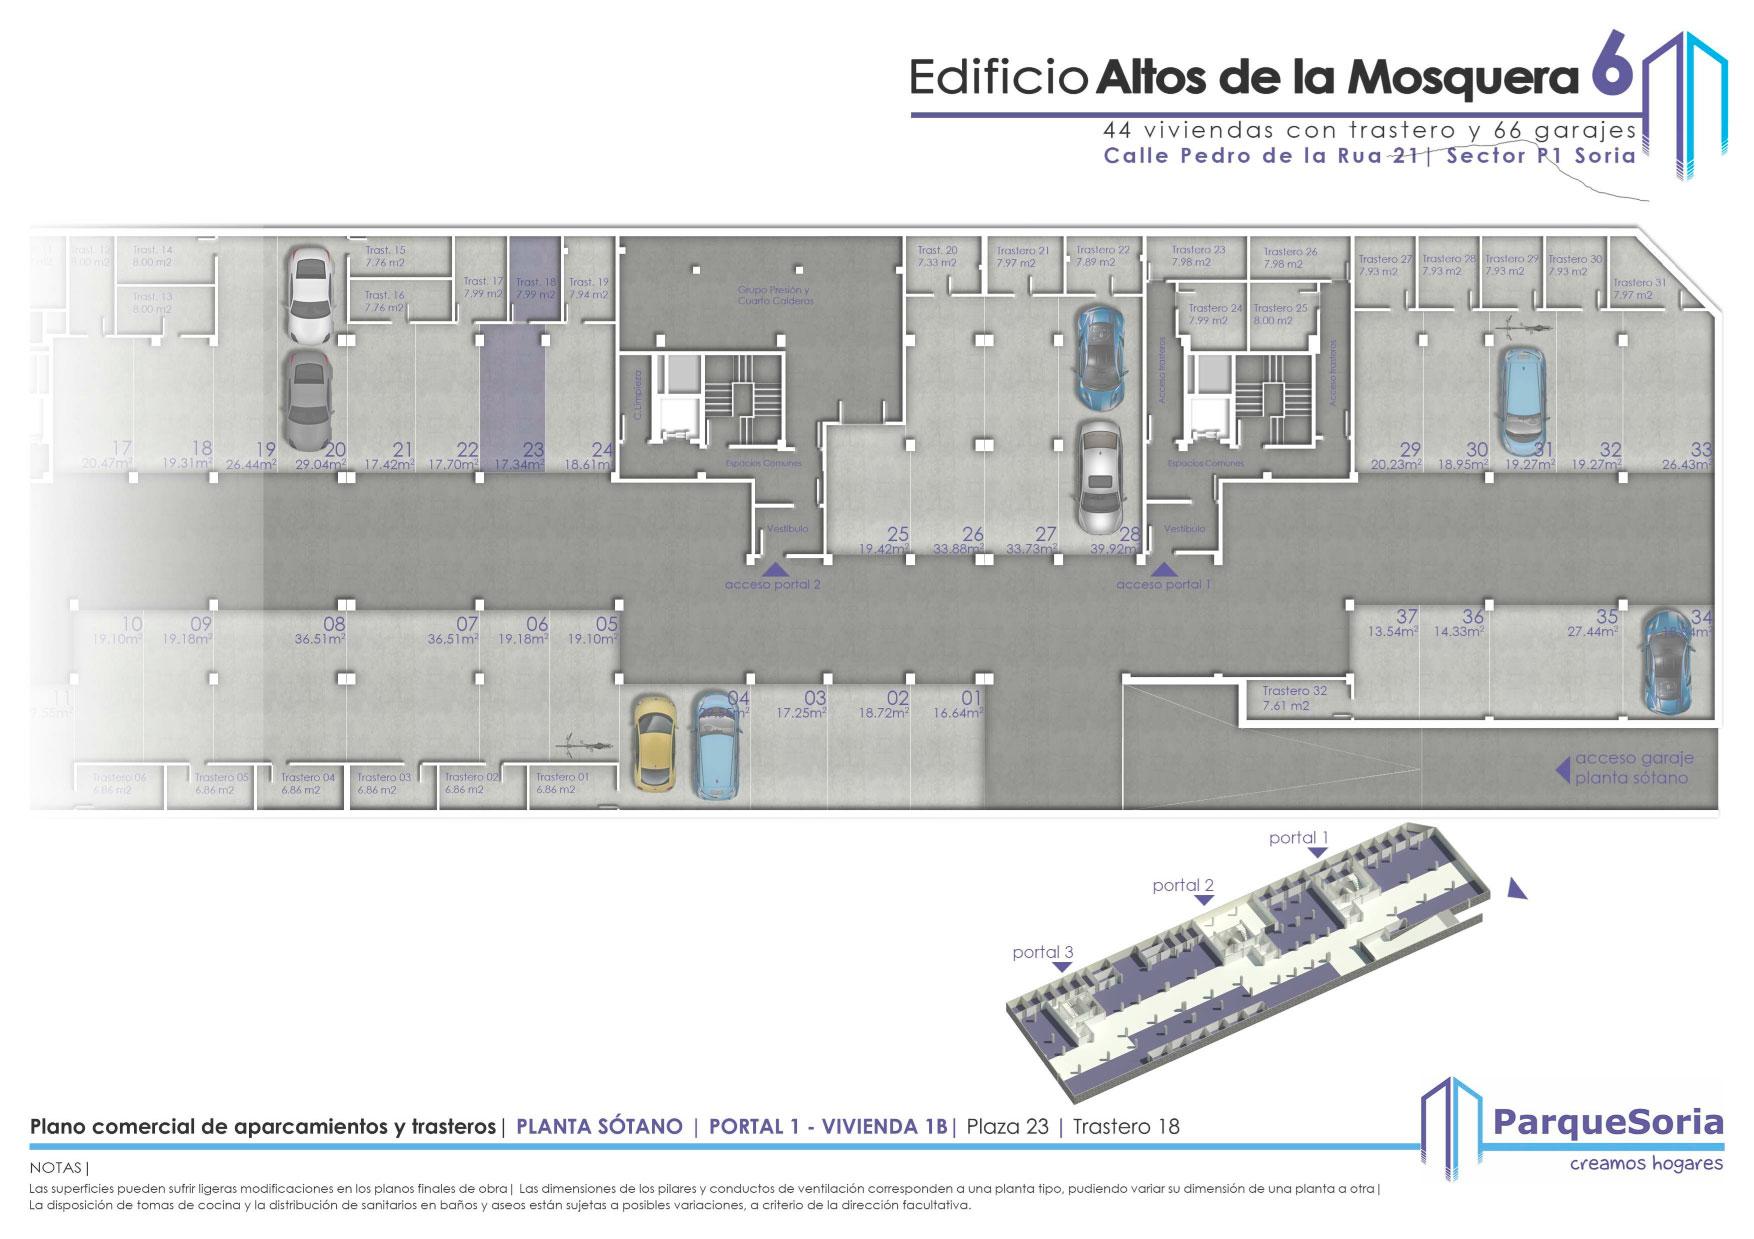 Parquesoria-Altos-de-la-mosquera-6-1B-2